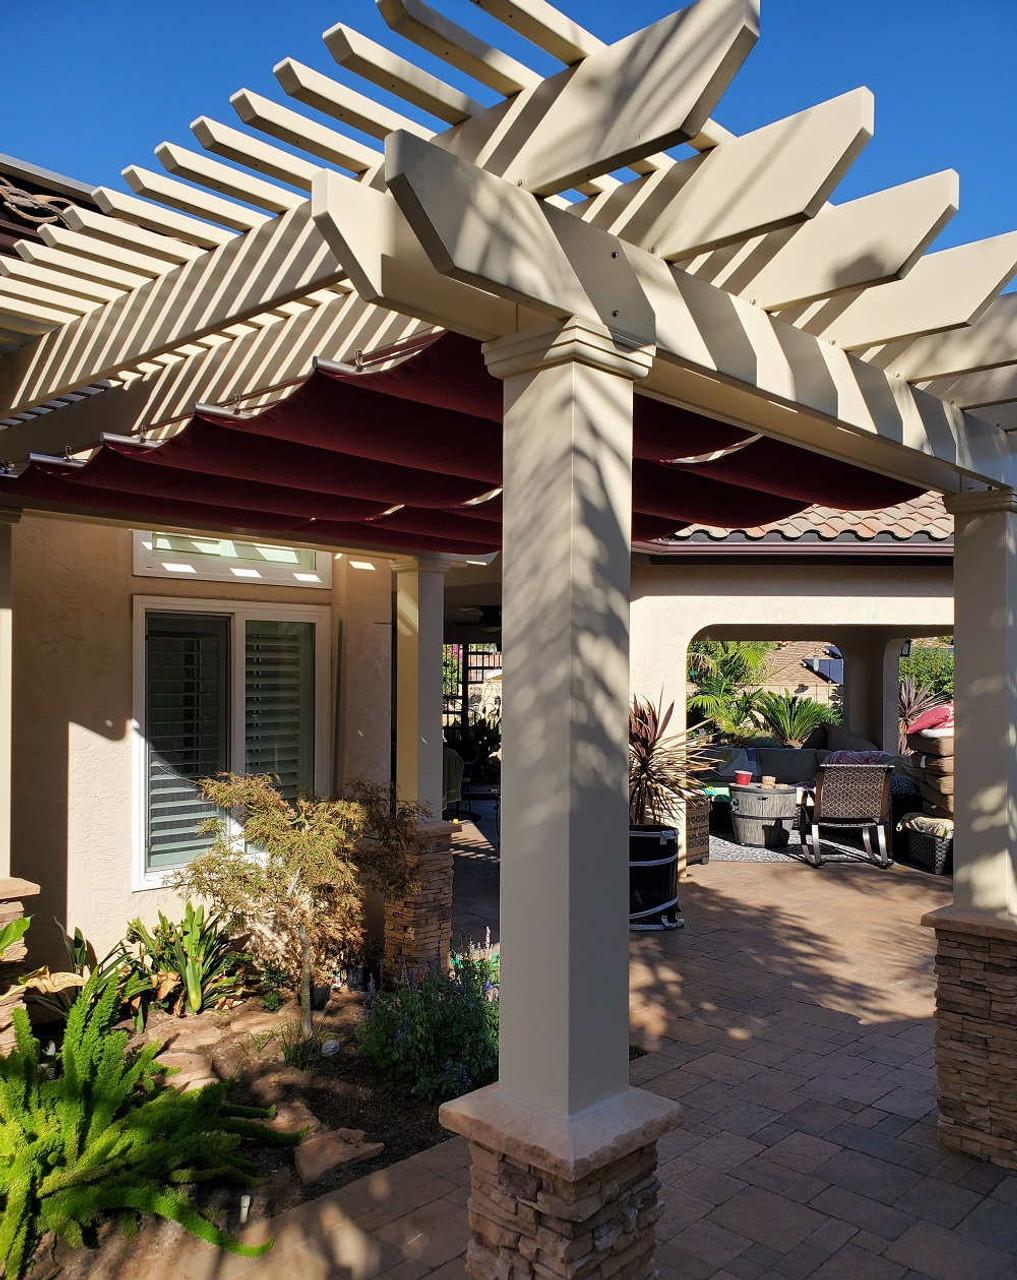 11x13 Freestanding Fiberglass Pergola with Canopy, Santee, CA